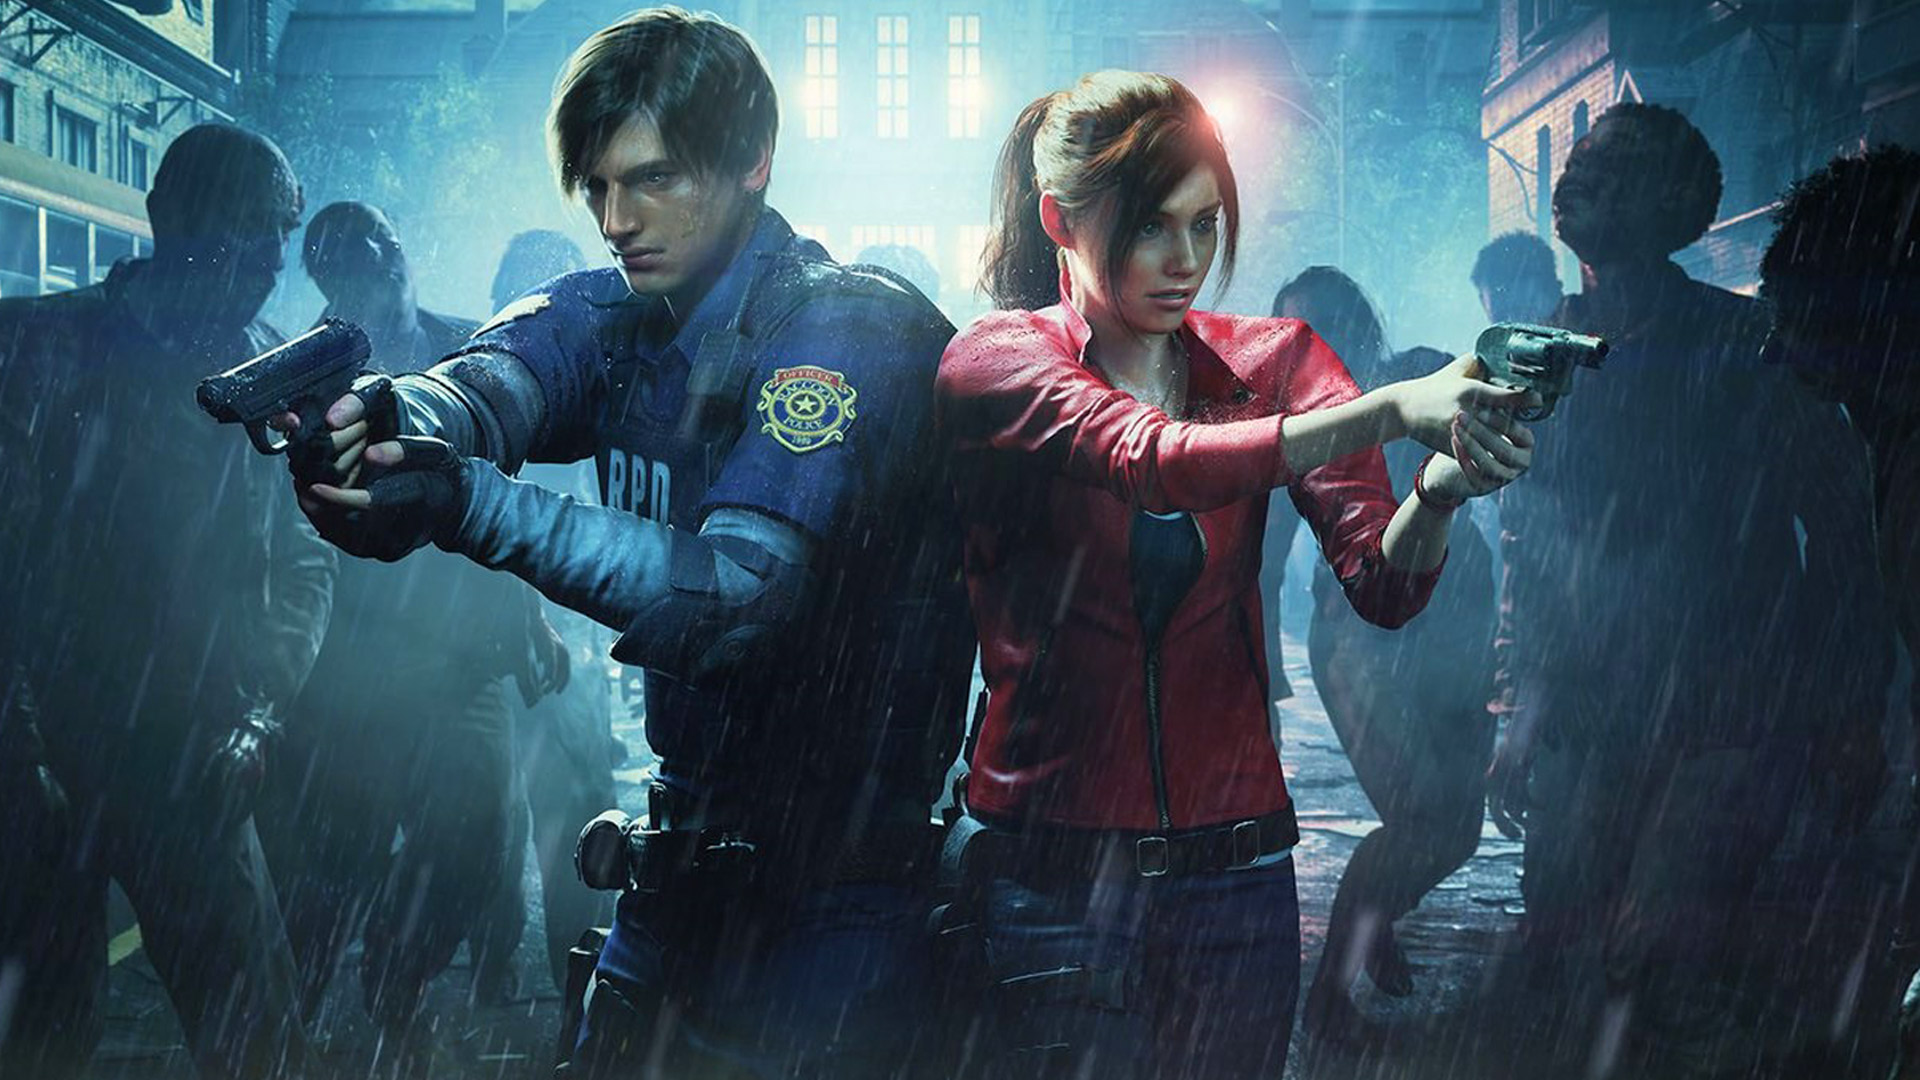 Вышел трейлер новой Resident Evil с кооперативом